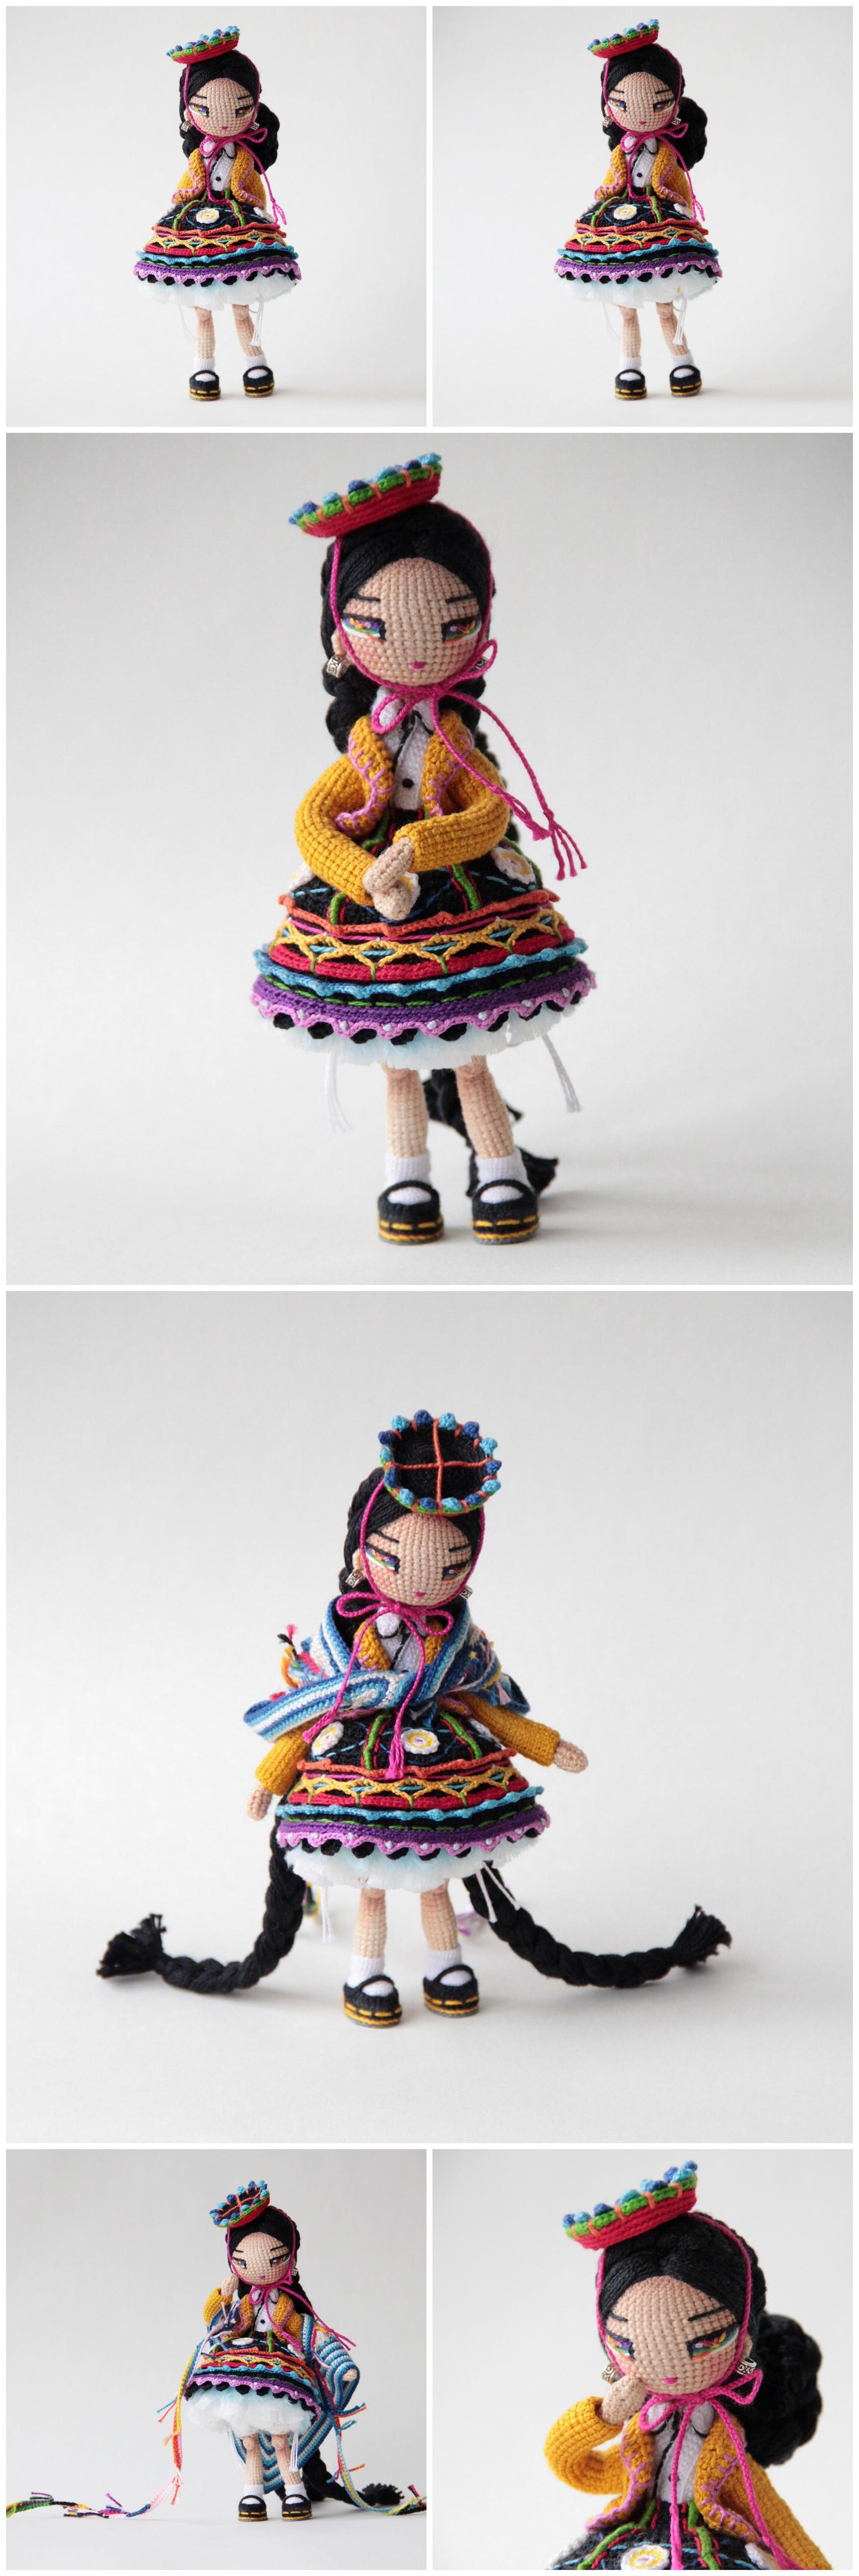 Best Amigurumi Doll Designer Kukukolki Crochet Patterns